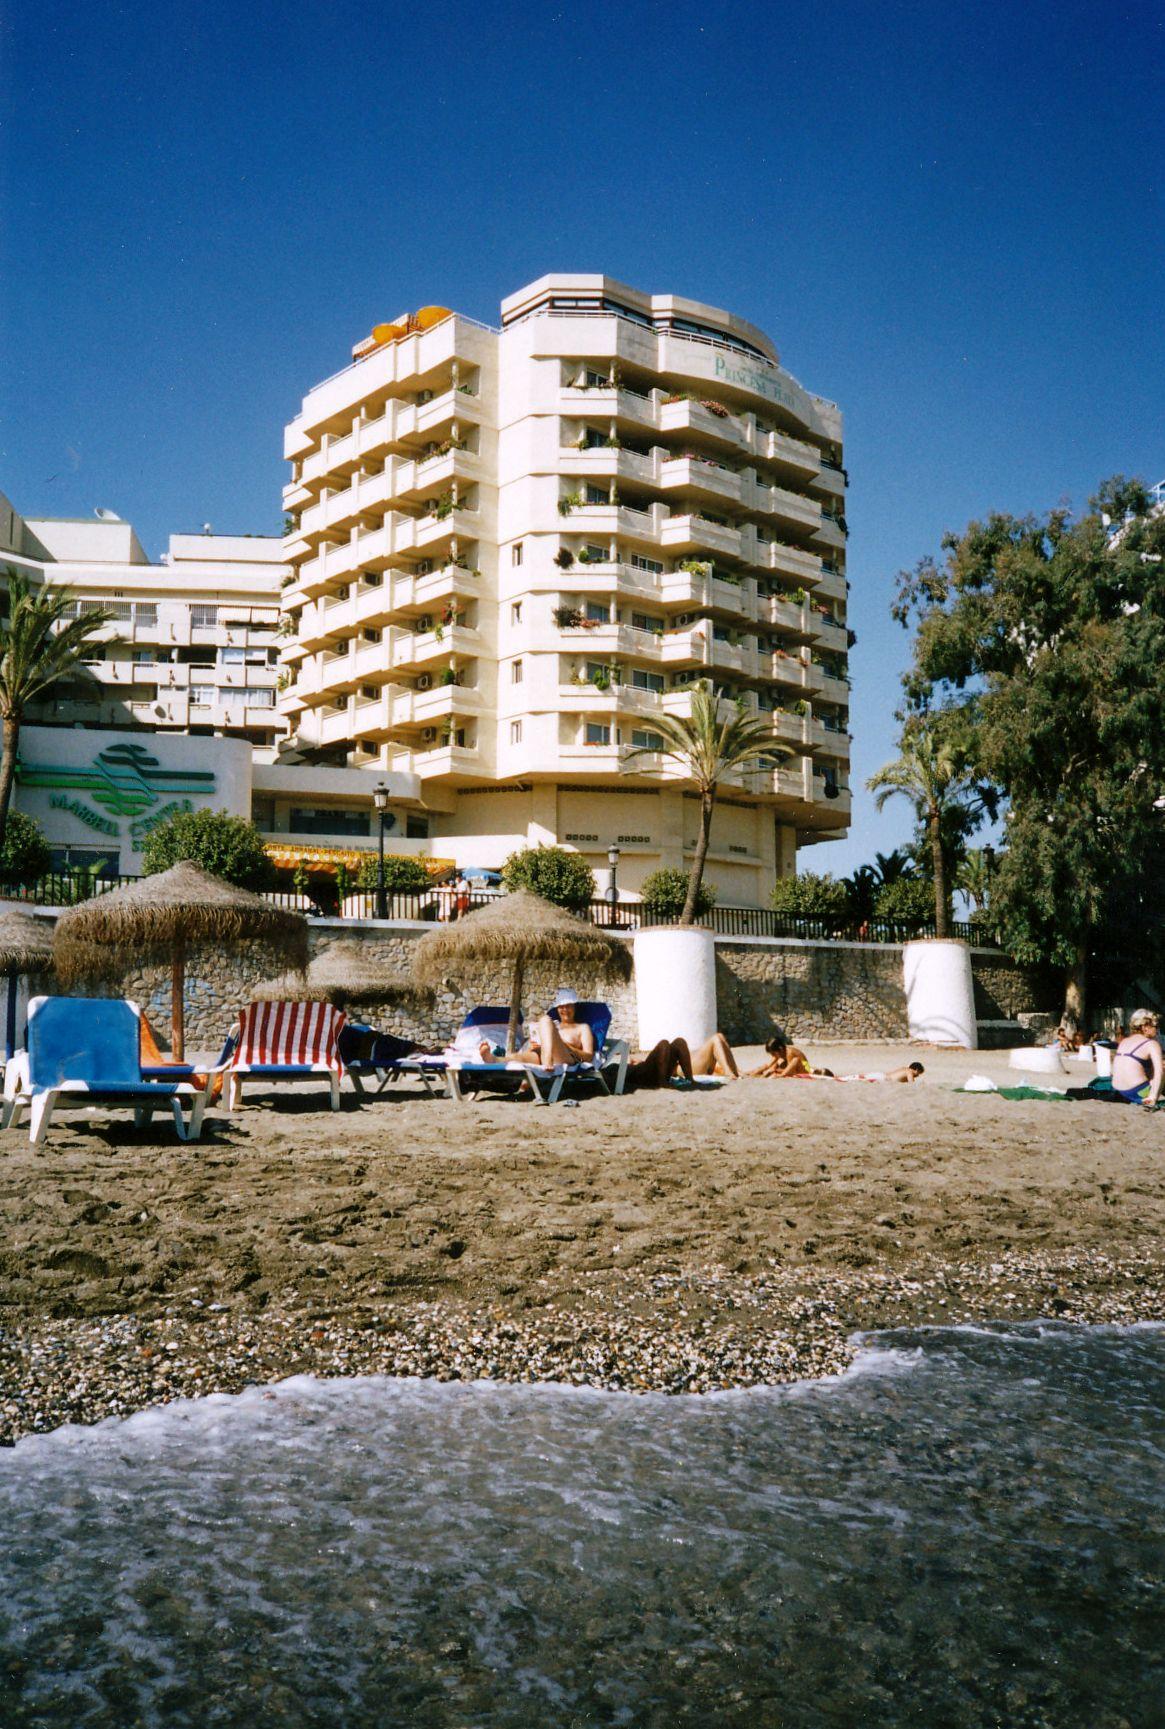 Hotel Marbella Playa Malaga